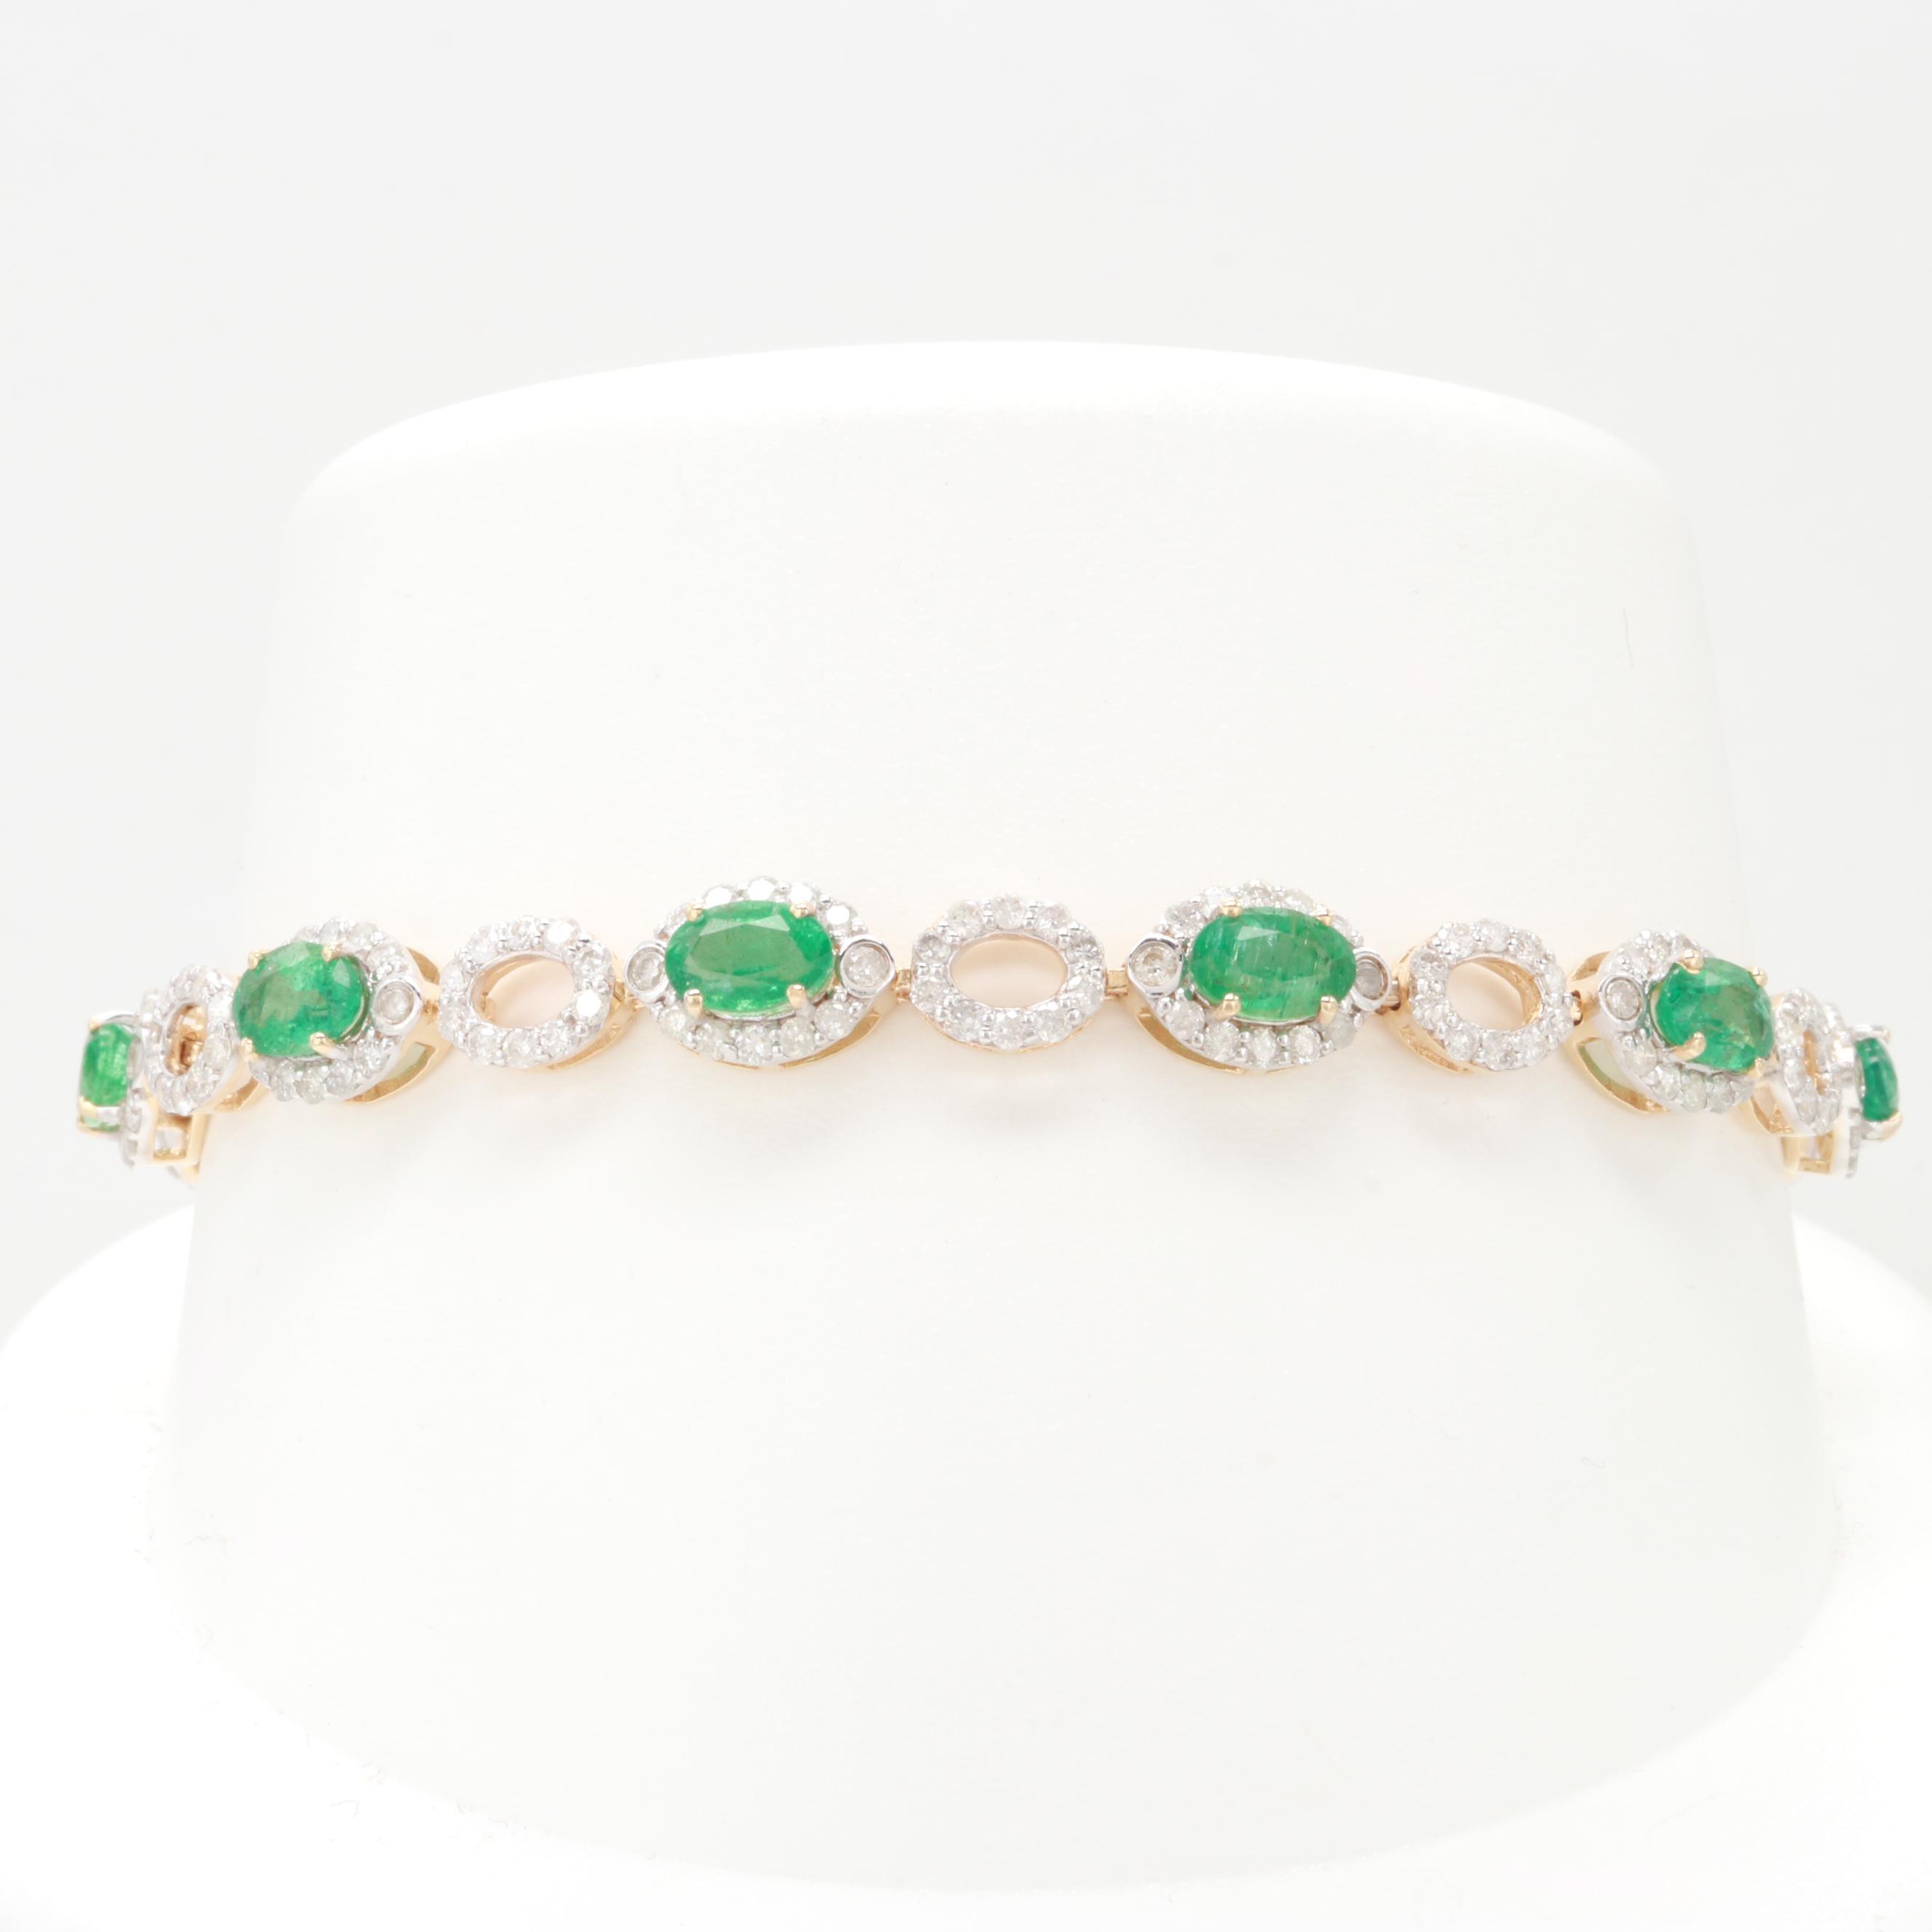 14K Yellow Gold Emerald and 3.02 CTW Diamond Bracelet